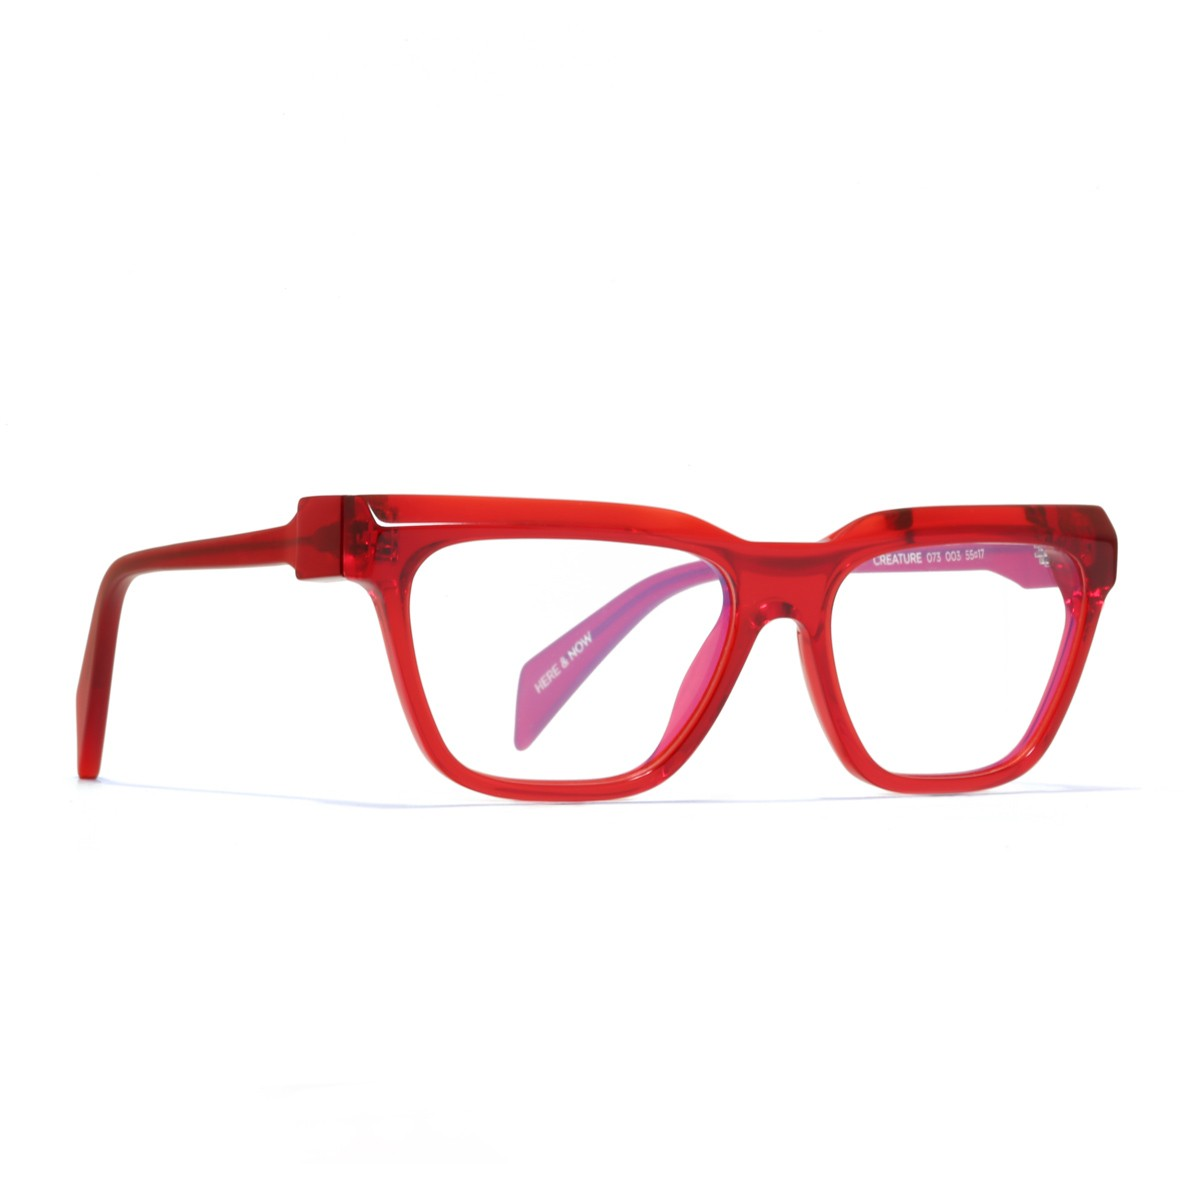 Siens Eye code 073 | Occhiali da vista Unisex